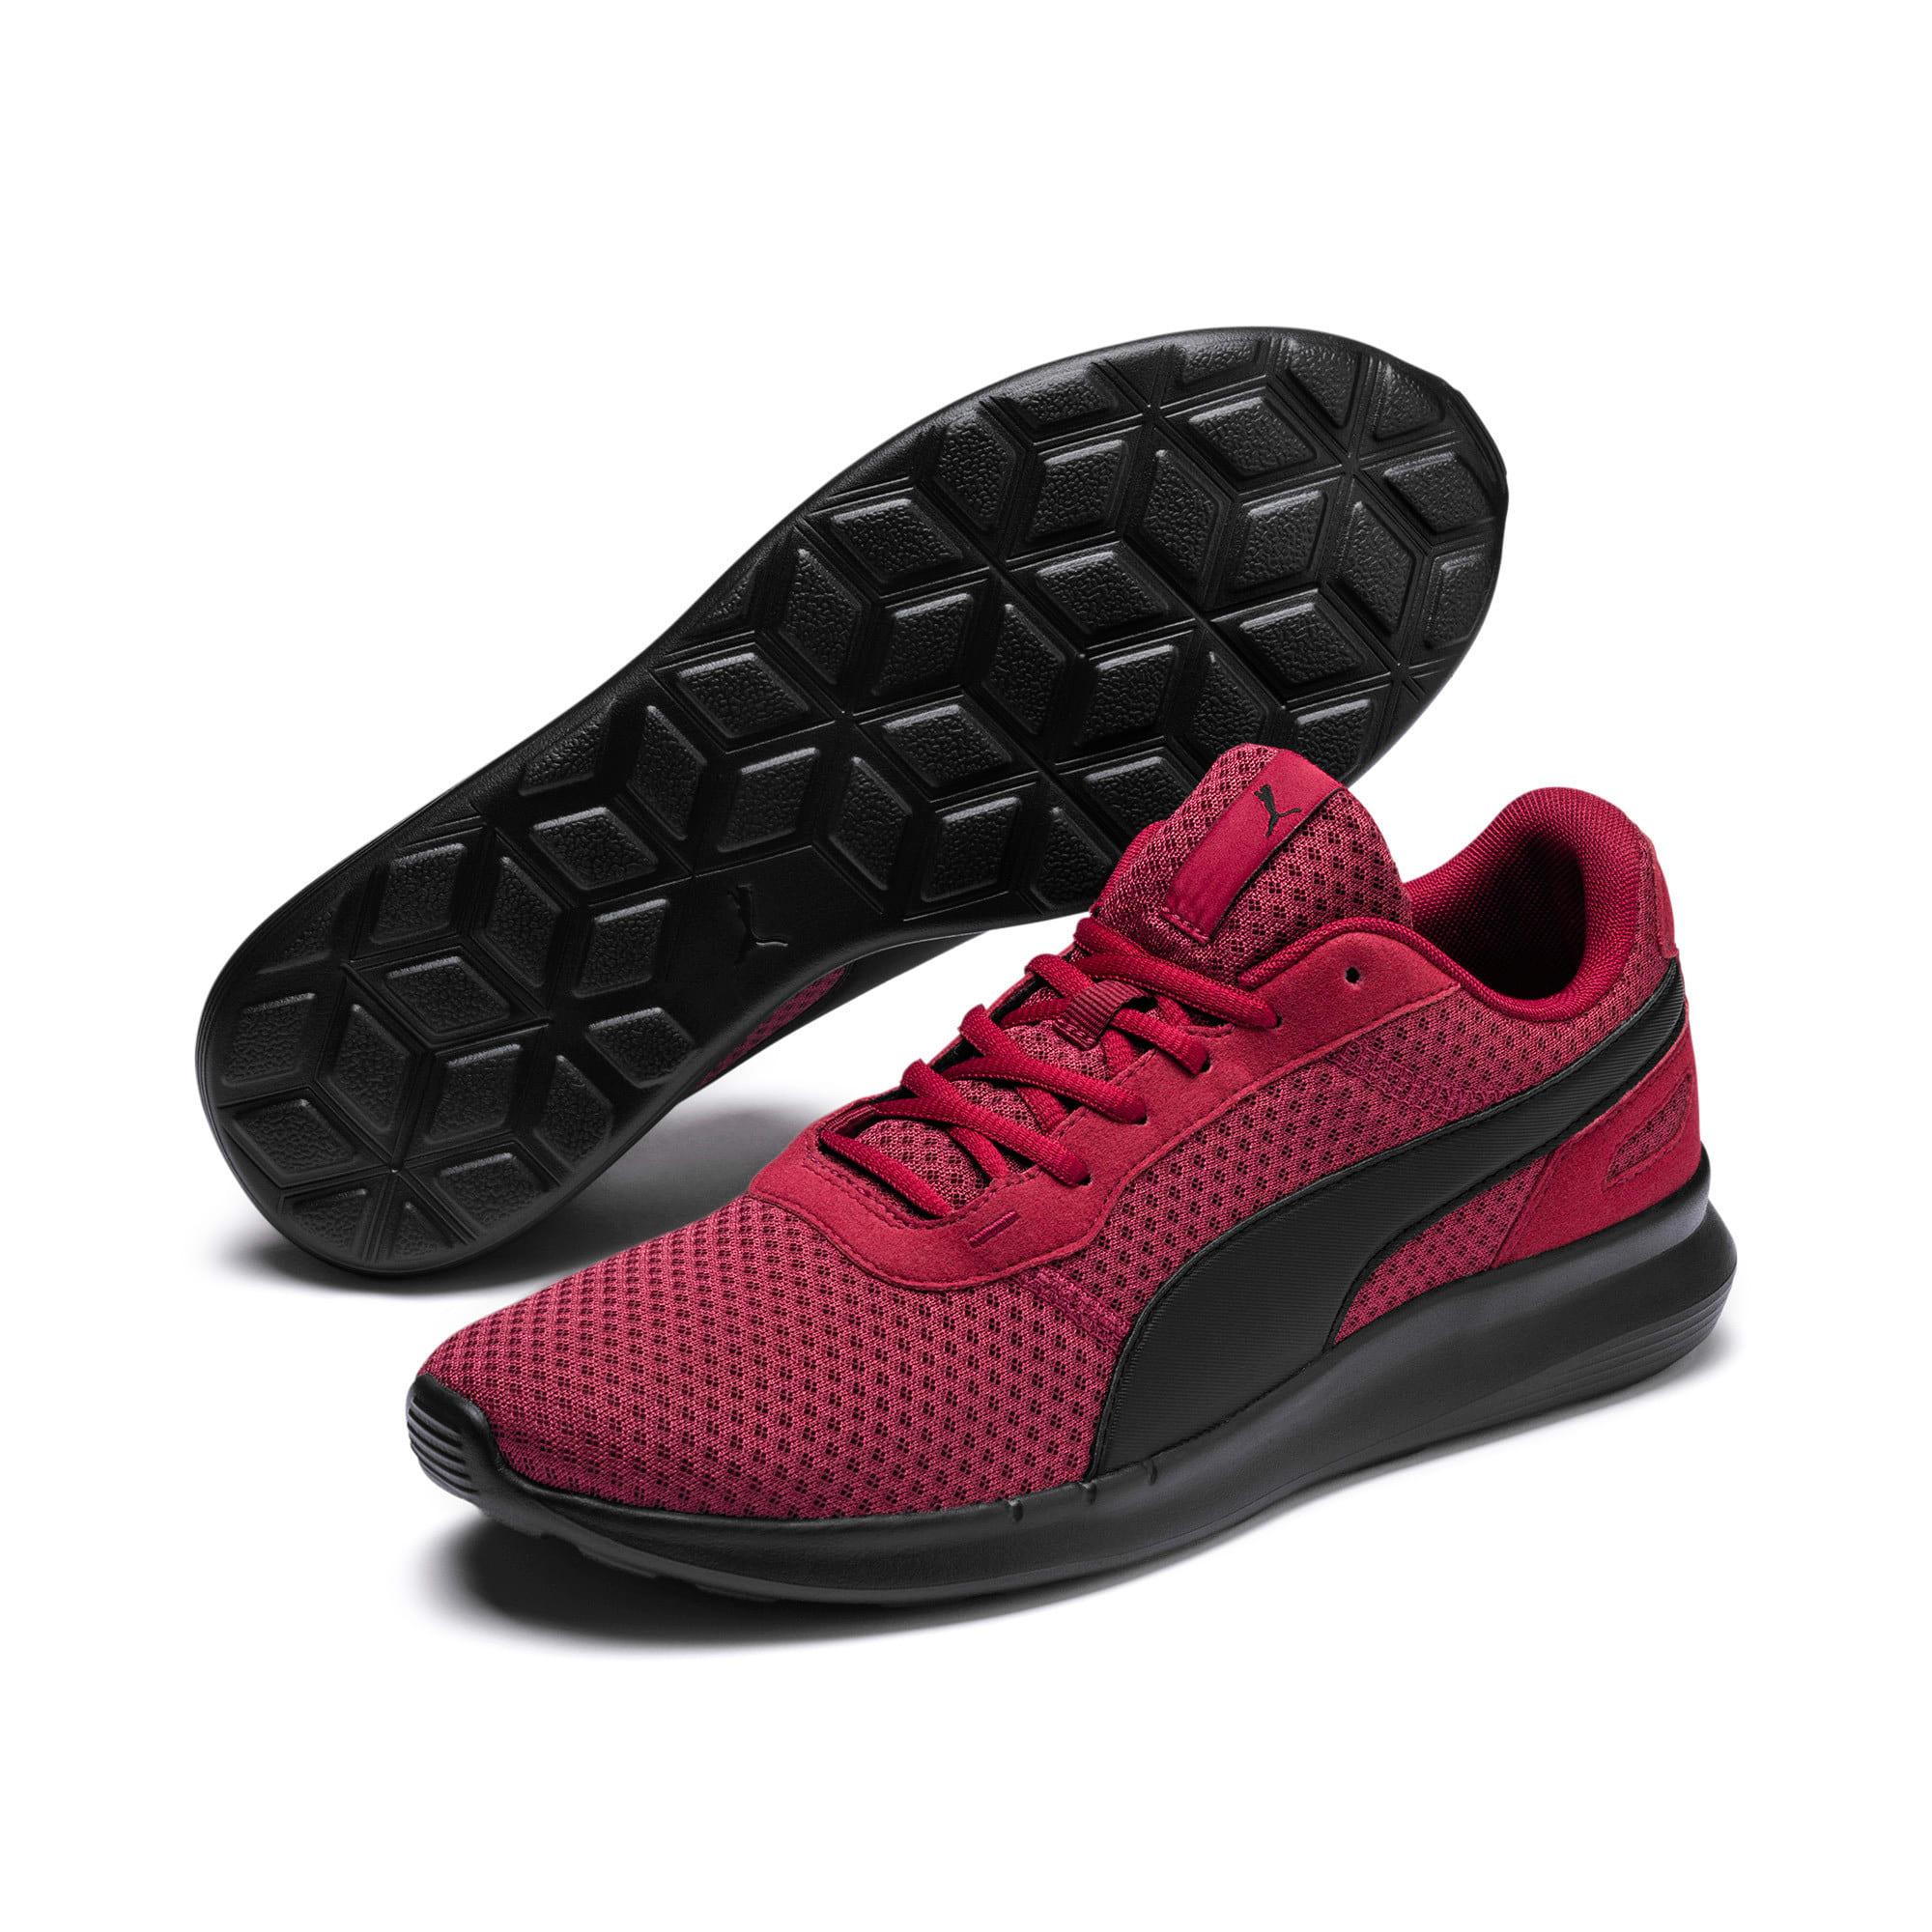 Thumbnail 2 of ST Activate Sneakers, Rhubarb-Puma Black, medium